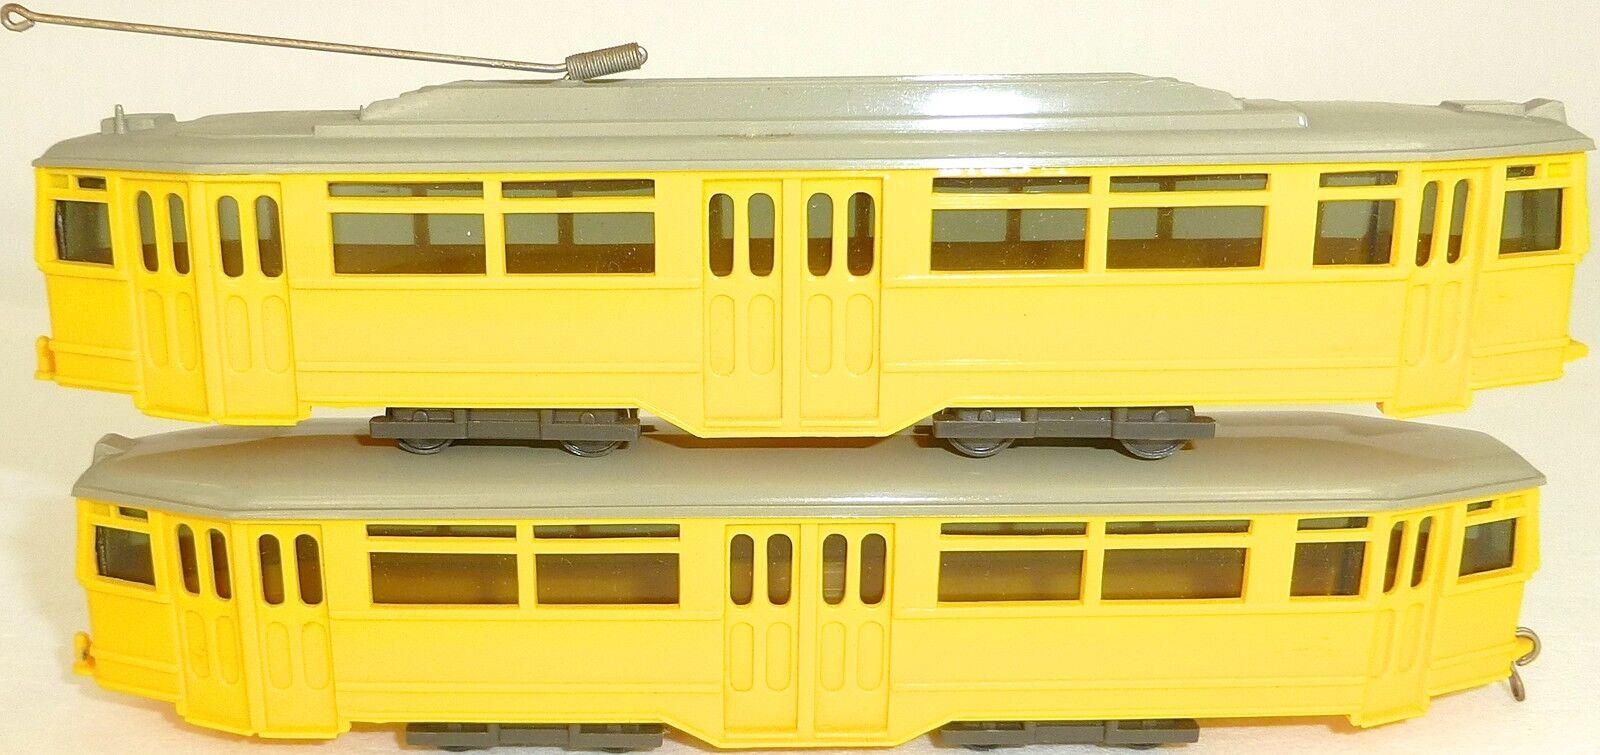 2 pcs tramway moteur voiture et Side-car jaune WIKING 740 741 h0 1 87 uy3 å